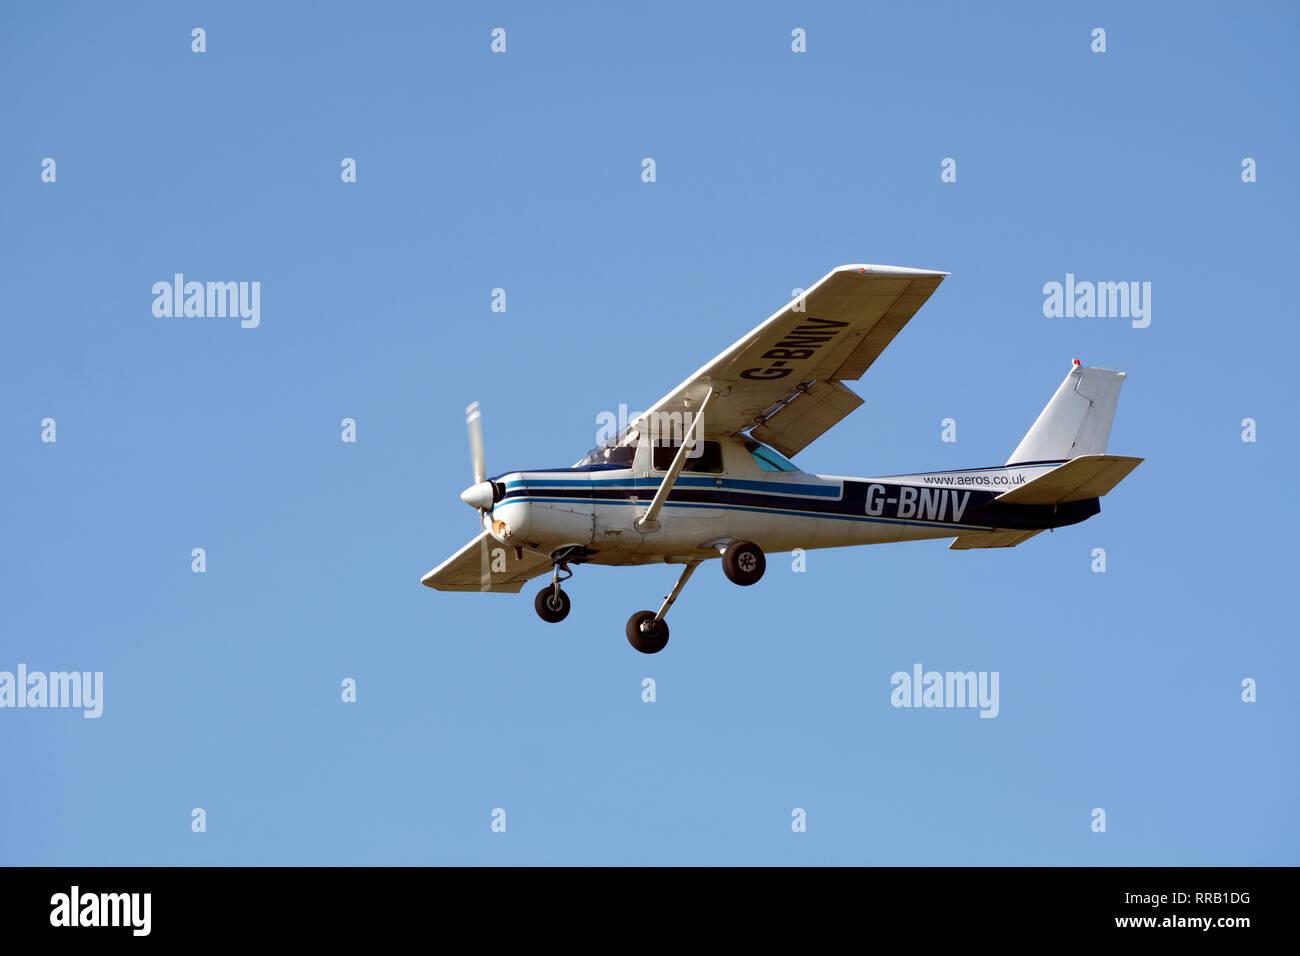 Cessna 152 at Wellesbourne Airfield, Warwickshire, UK (G-BNIV) - Stock Image